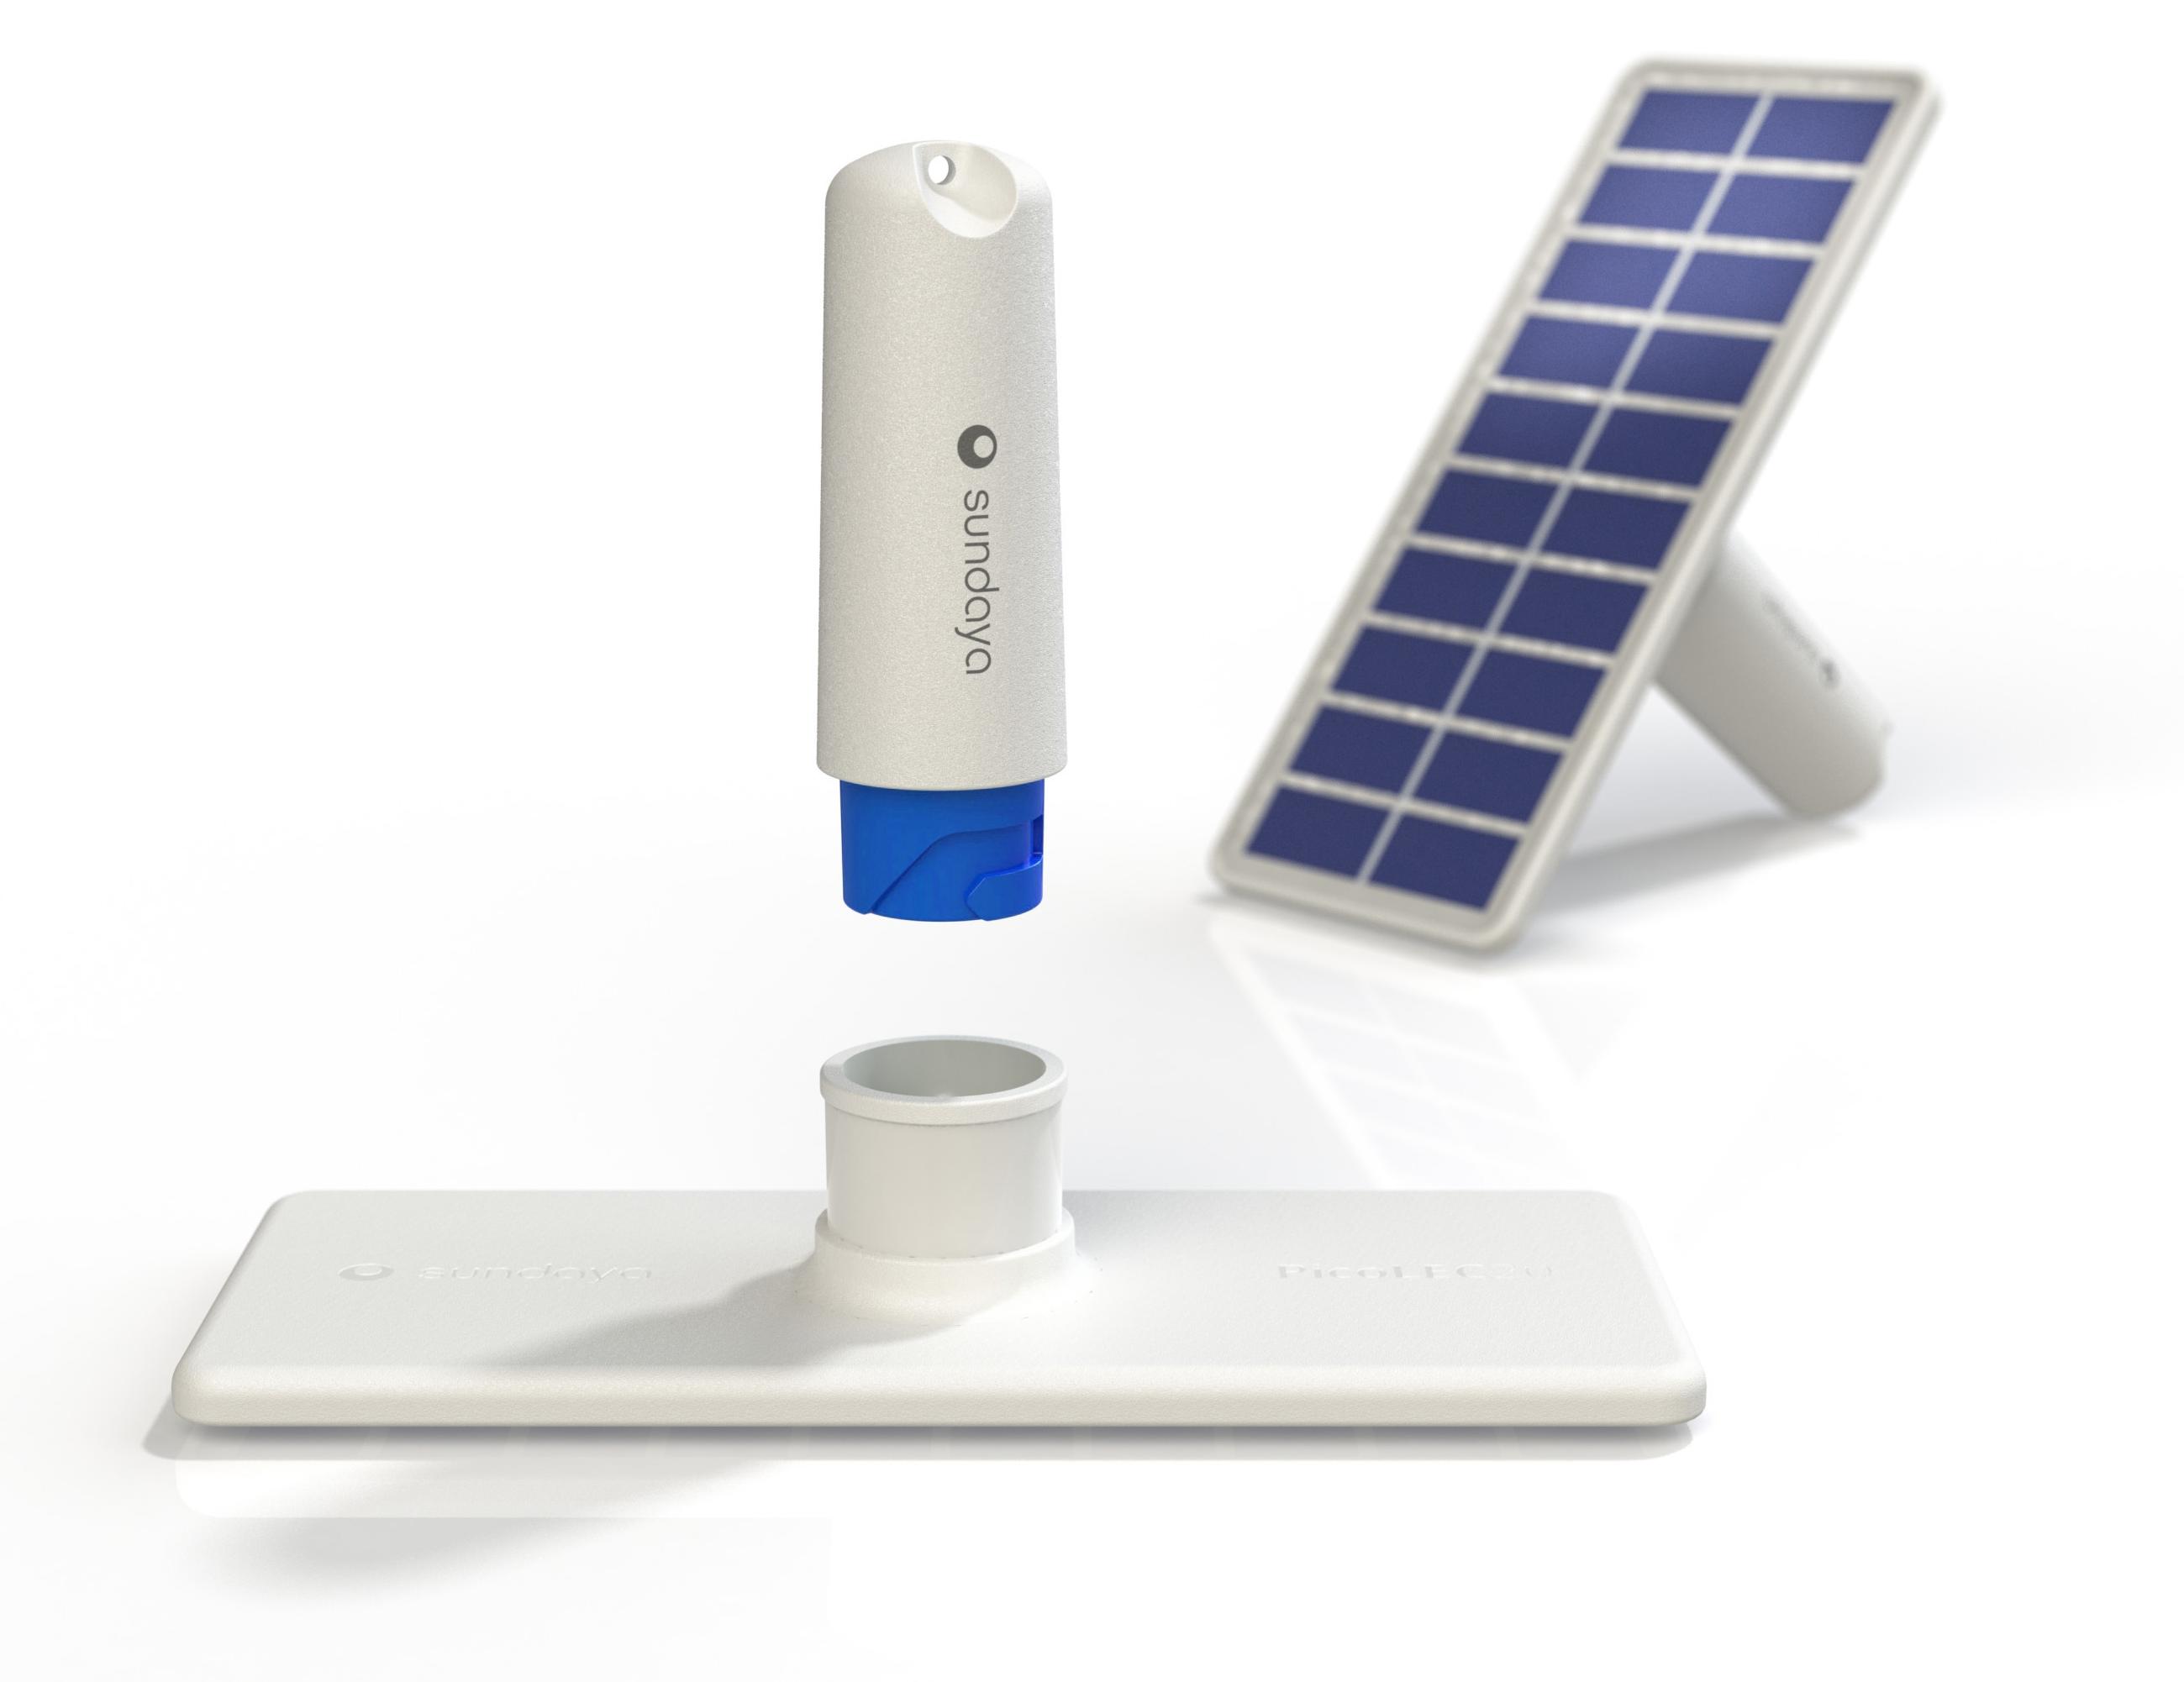 Sundaya Joule Stick Kit PHAESUN mobiles Solarpanel Licht